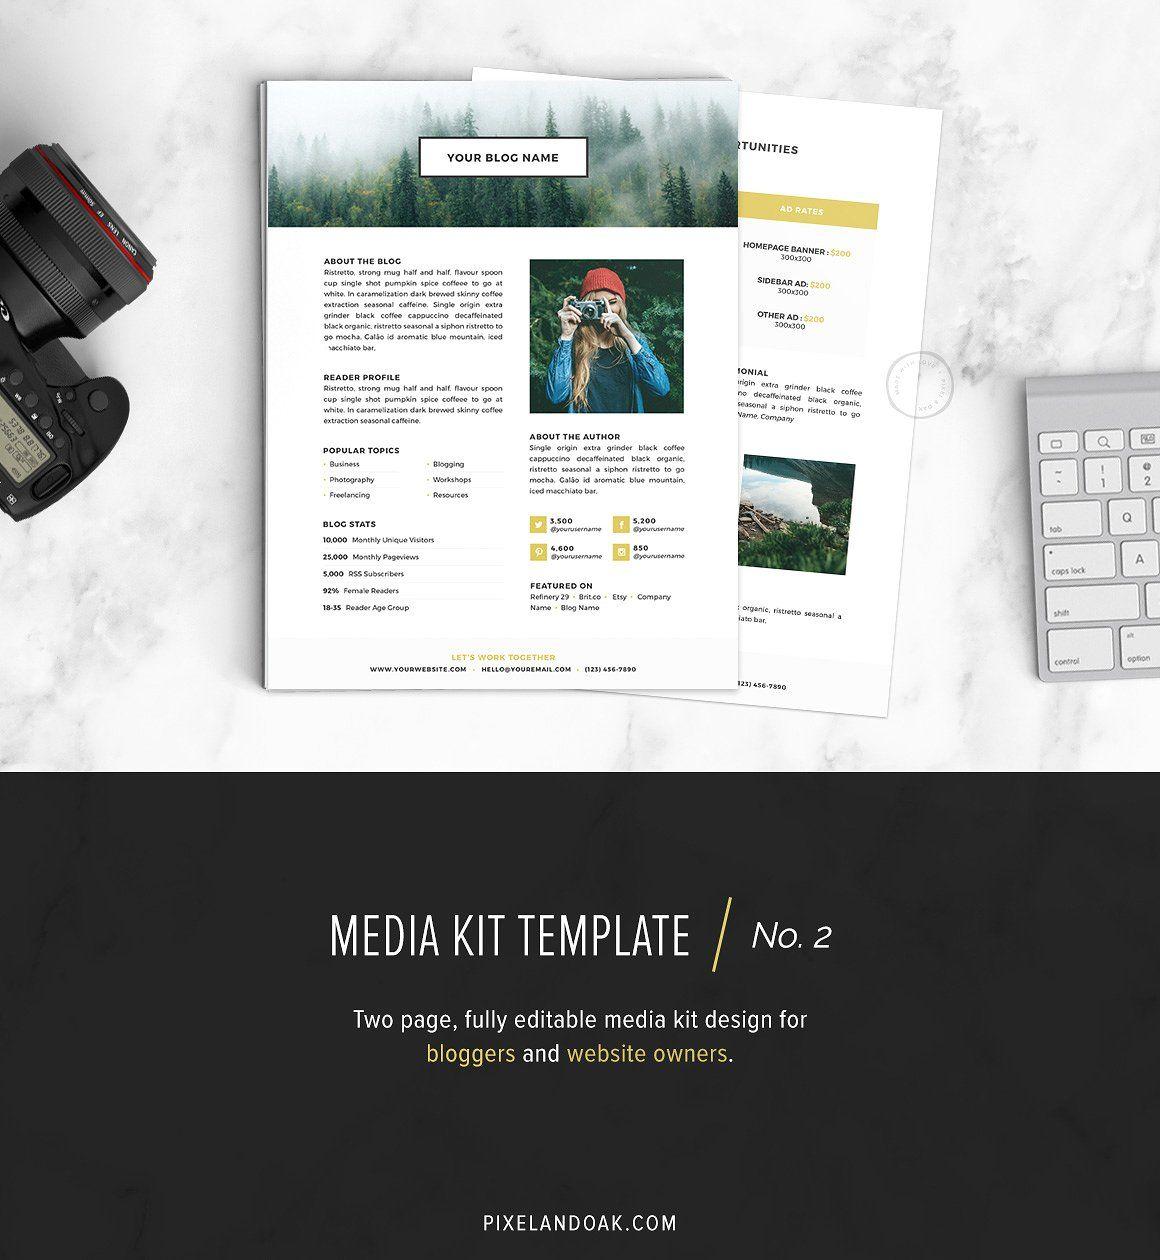 Pin by Top Rope Media on Design ideas | Pinterest | Media kit, Media ...